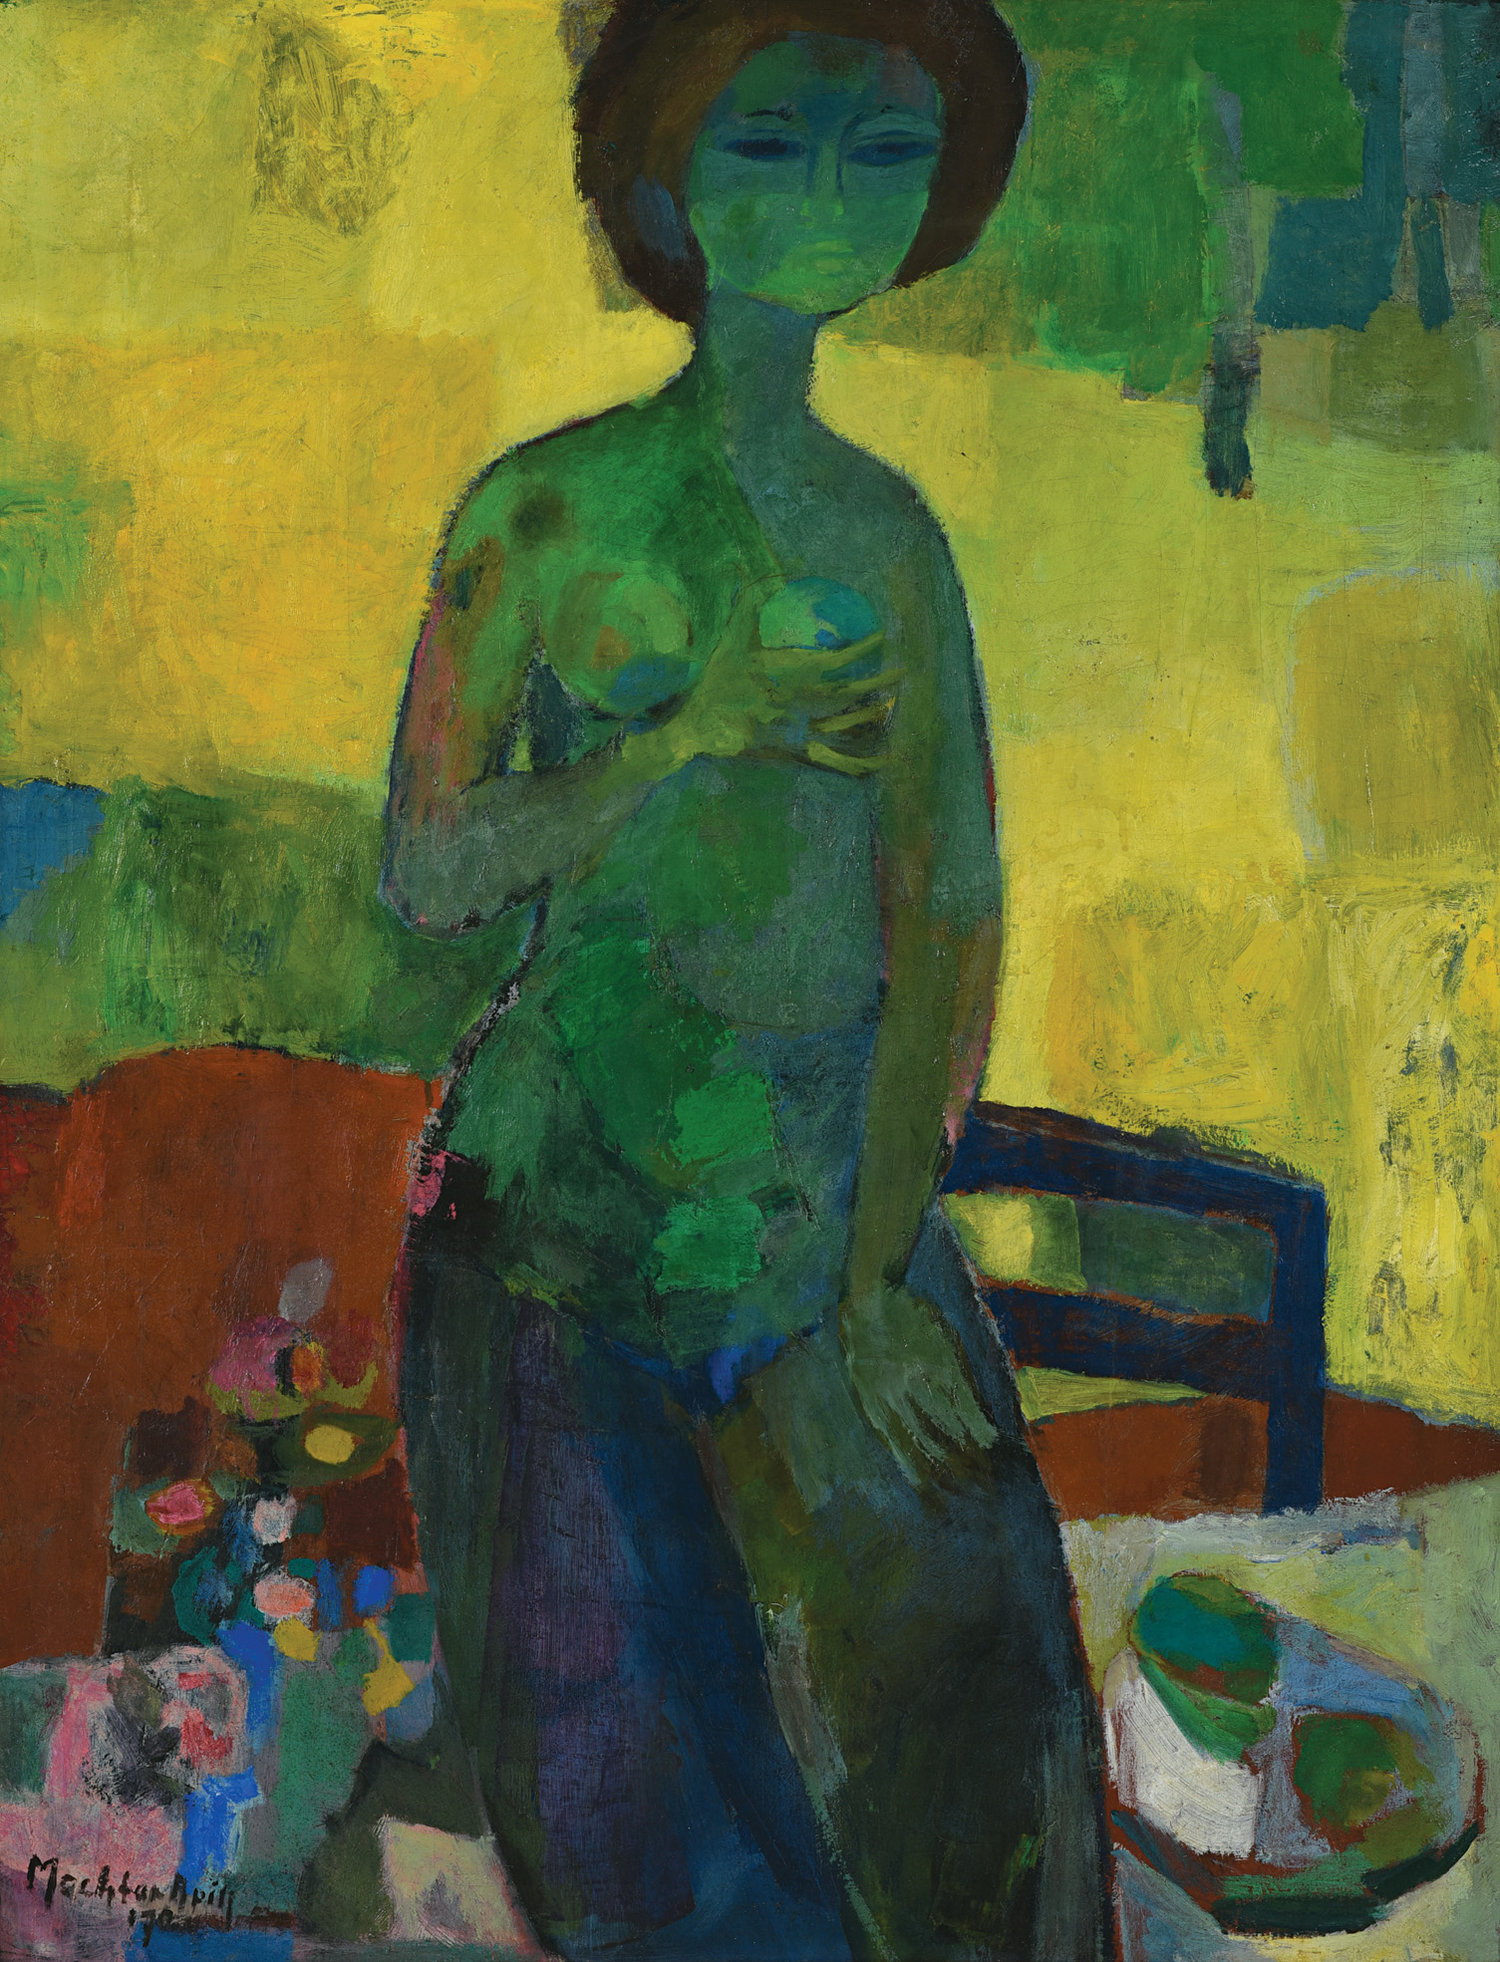 Mochtar Apin, Lady, oil on canvas, 117 x 86 cm, 1970